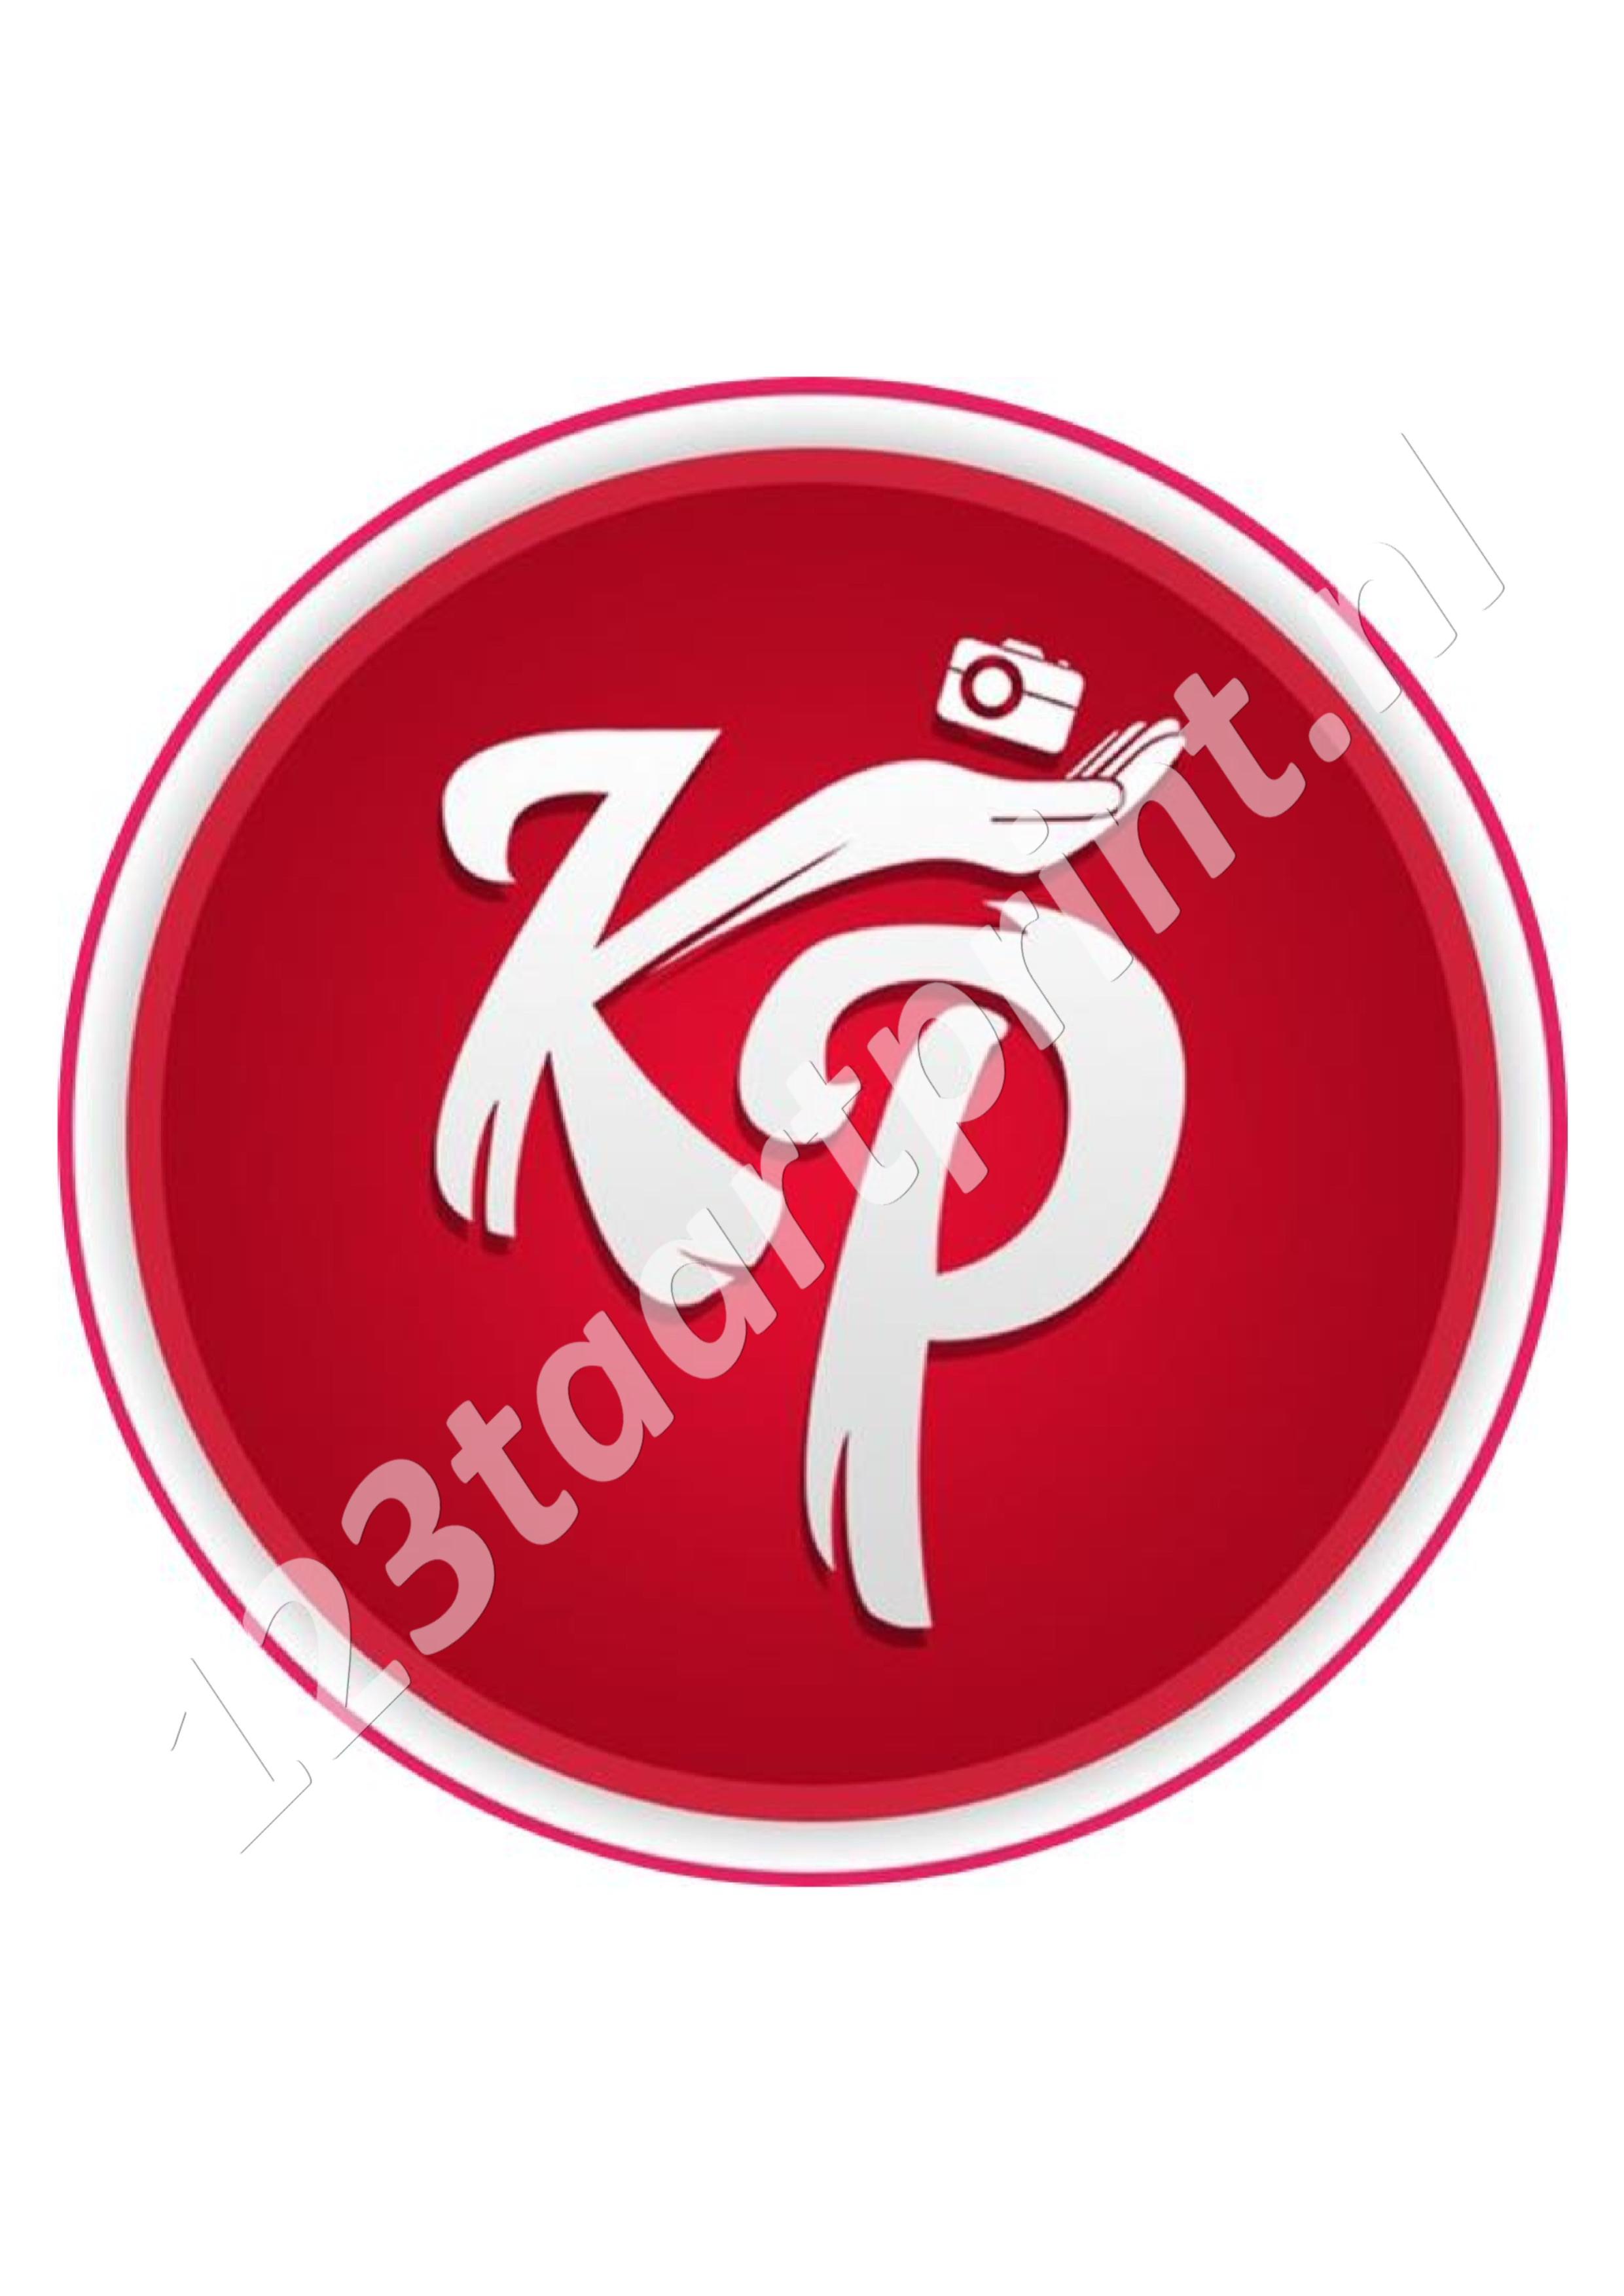 Knol Power logo Rond